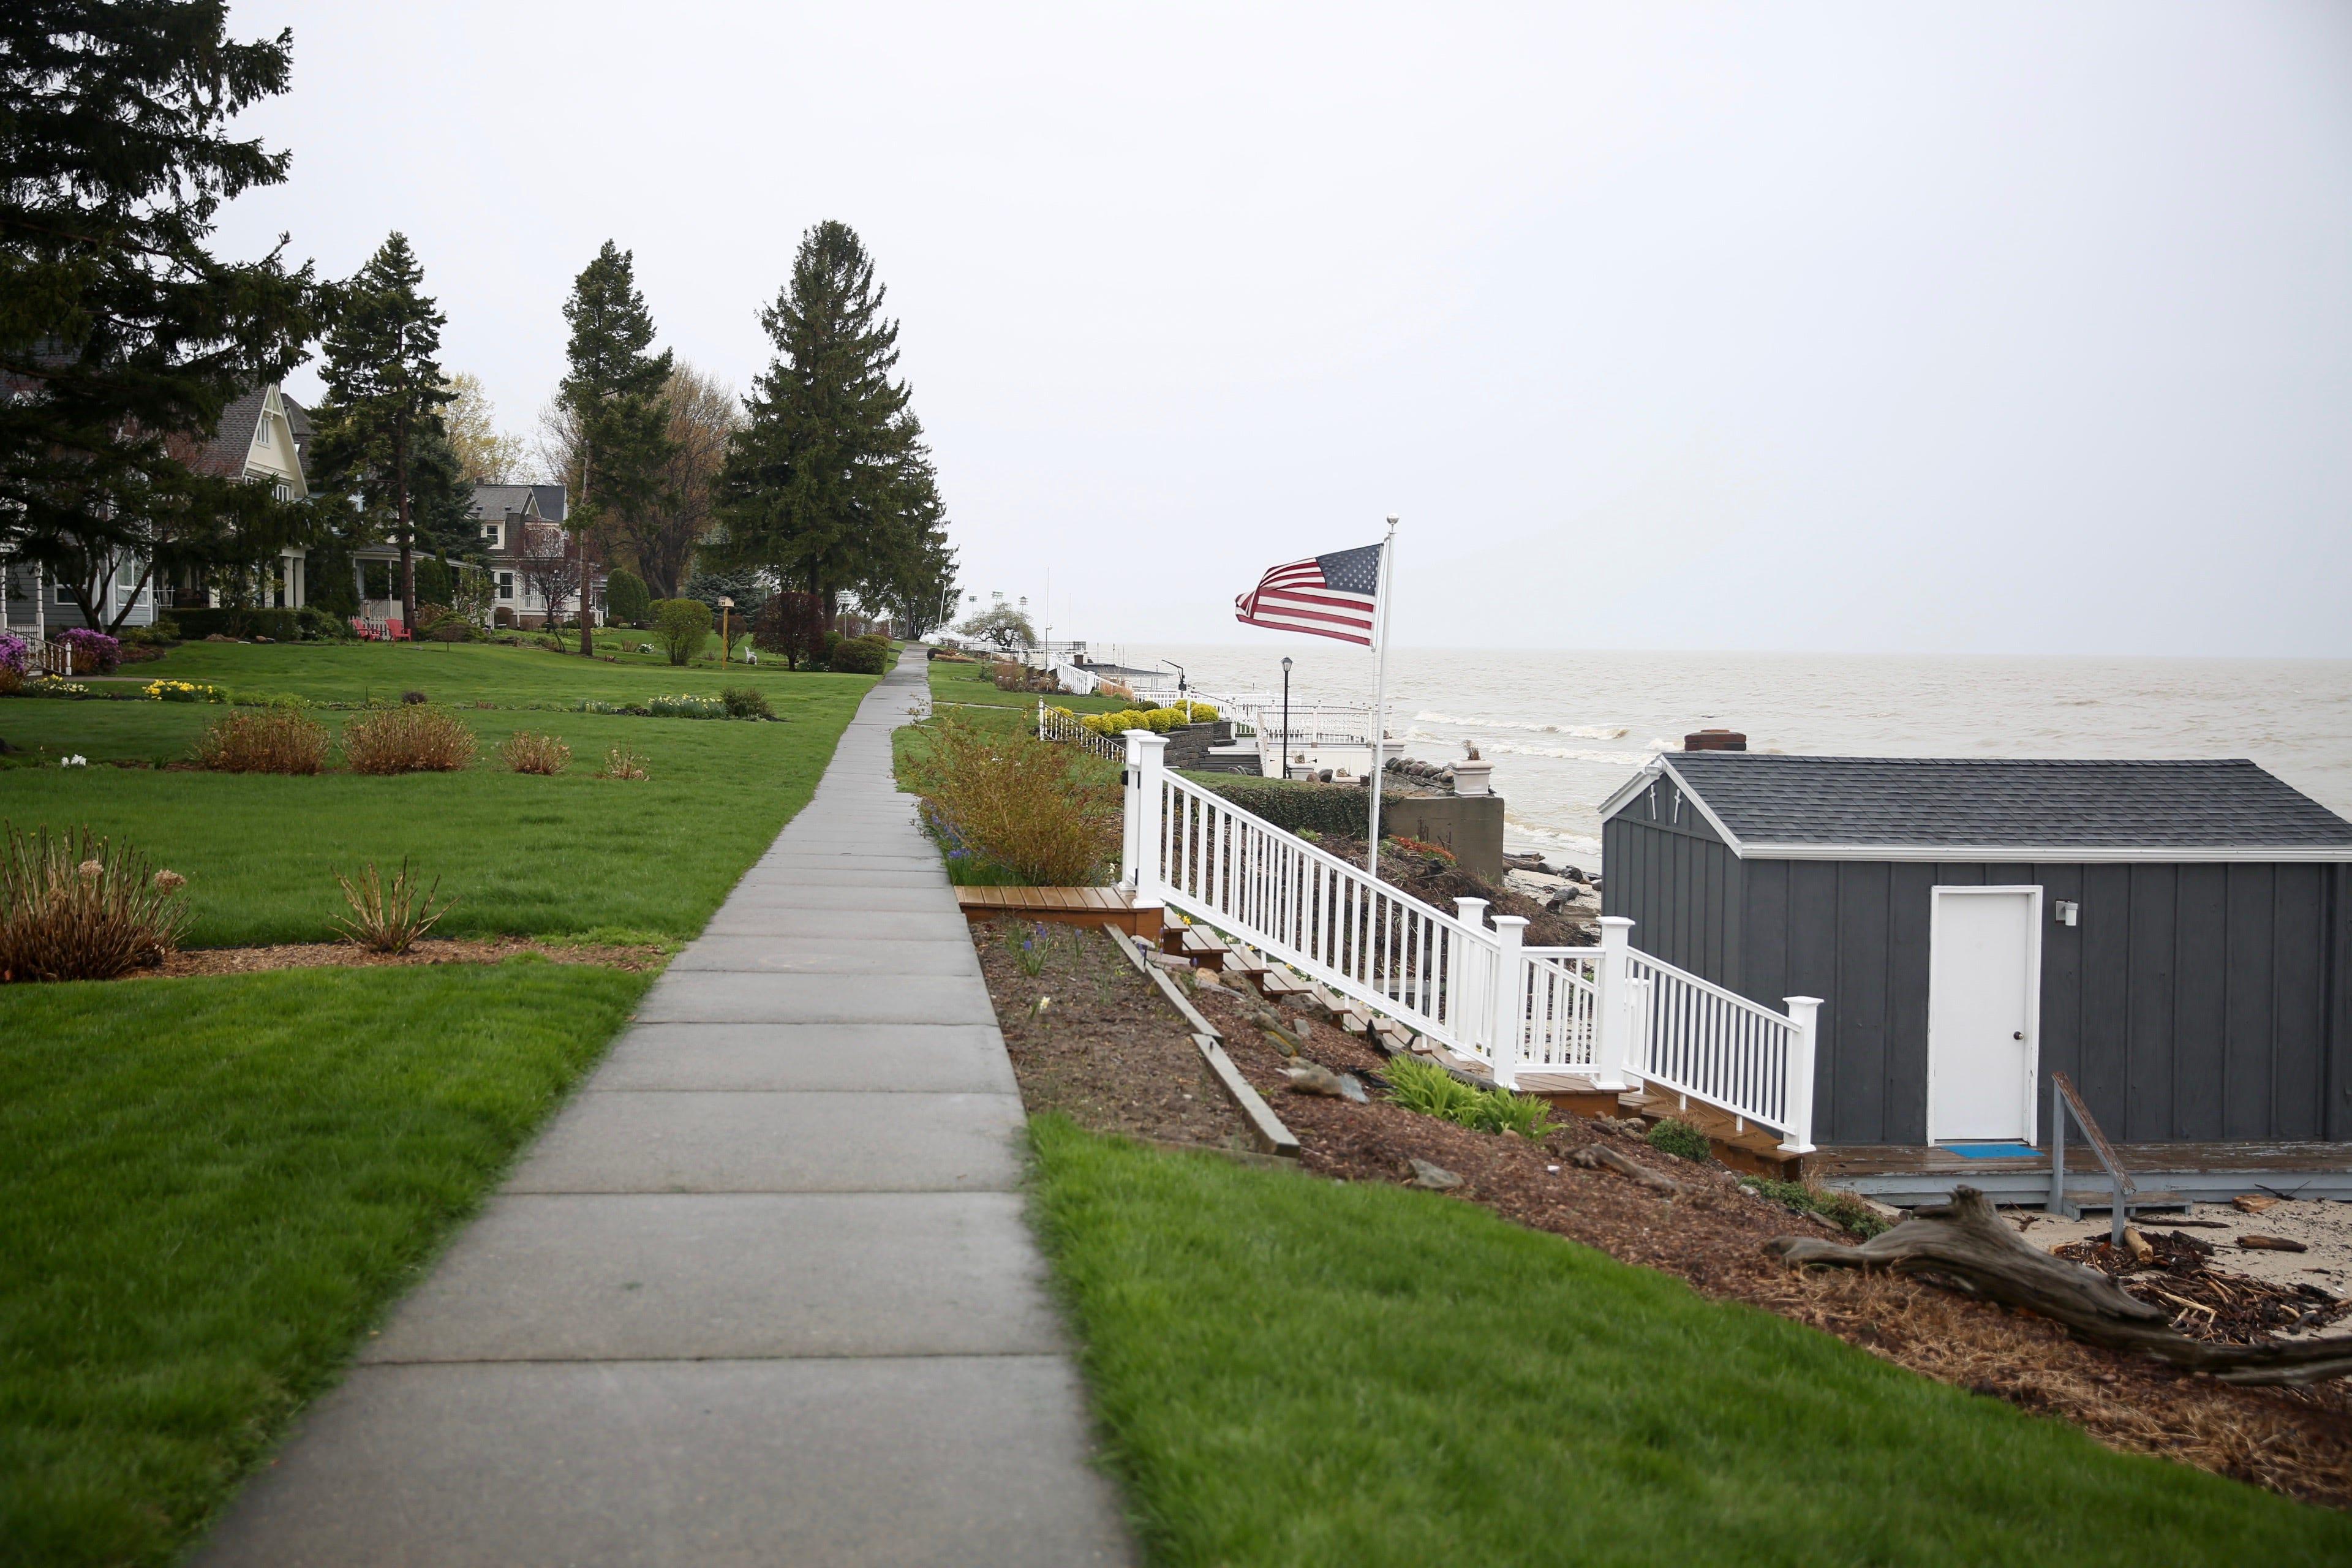 Sidewalk in private yard 45